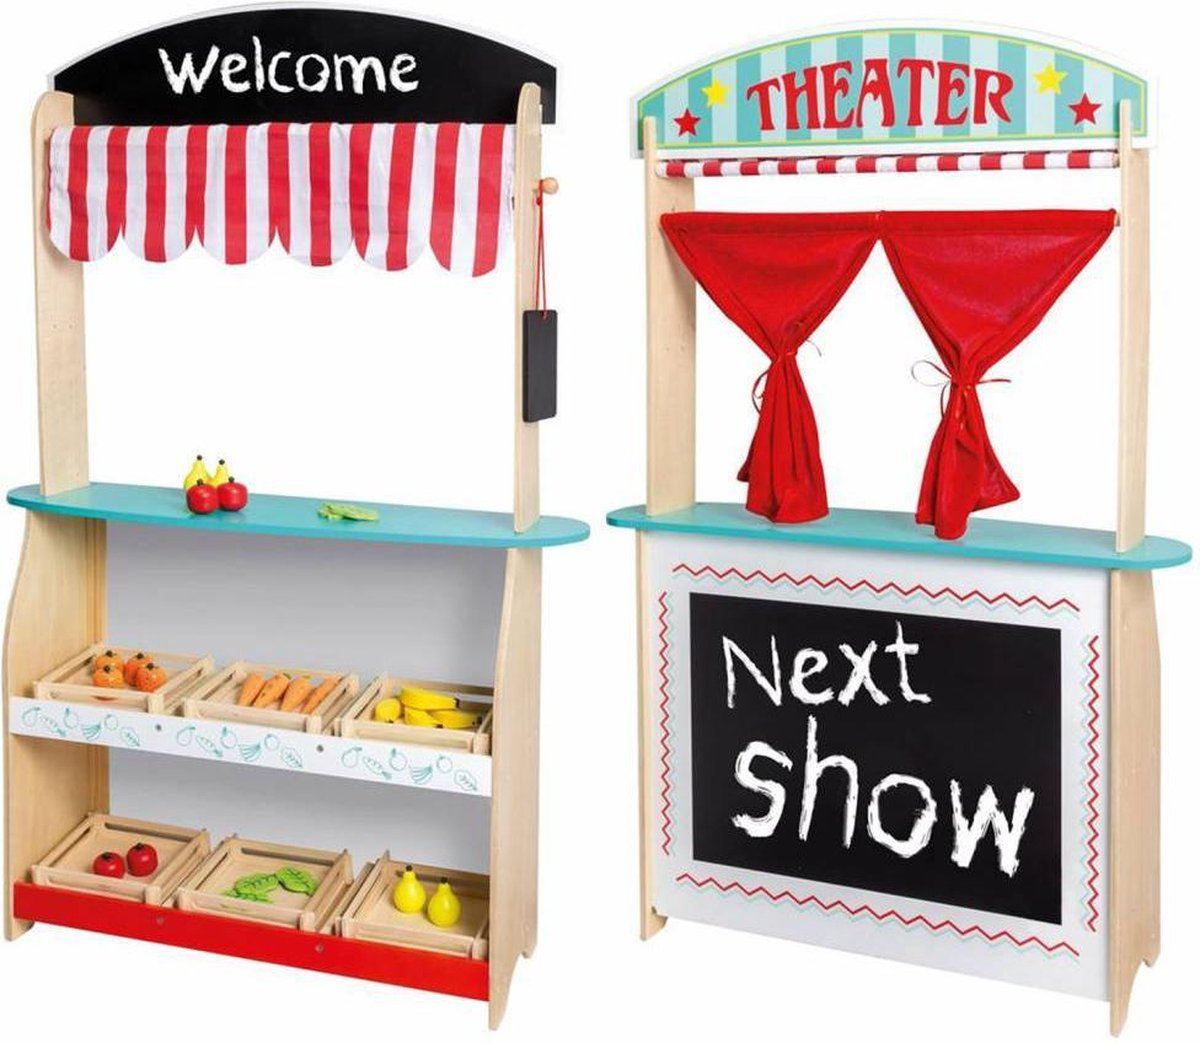 Jou co 2 in 1 Theater en Winkel met Accessoires